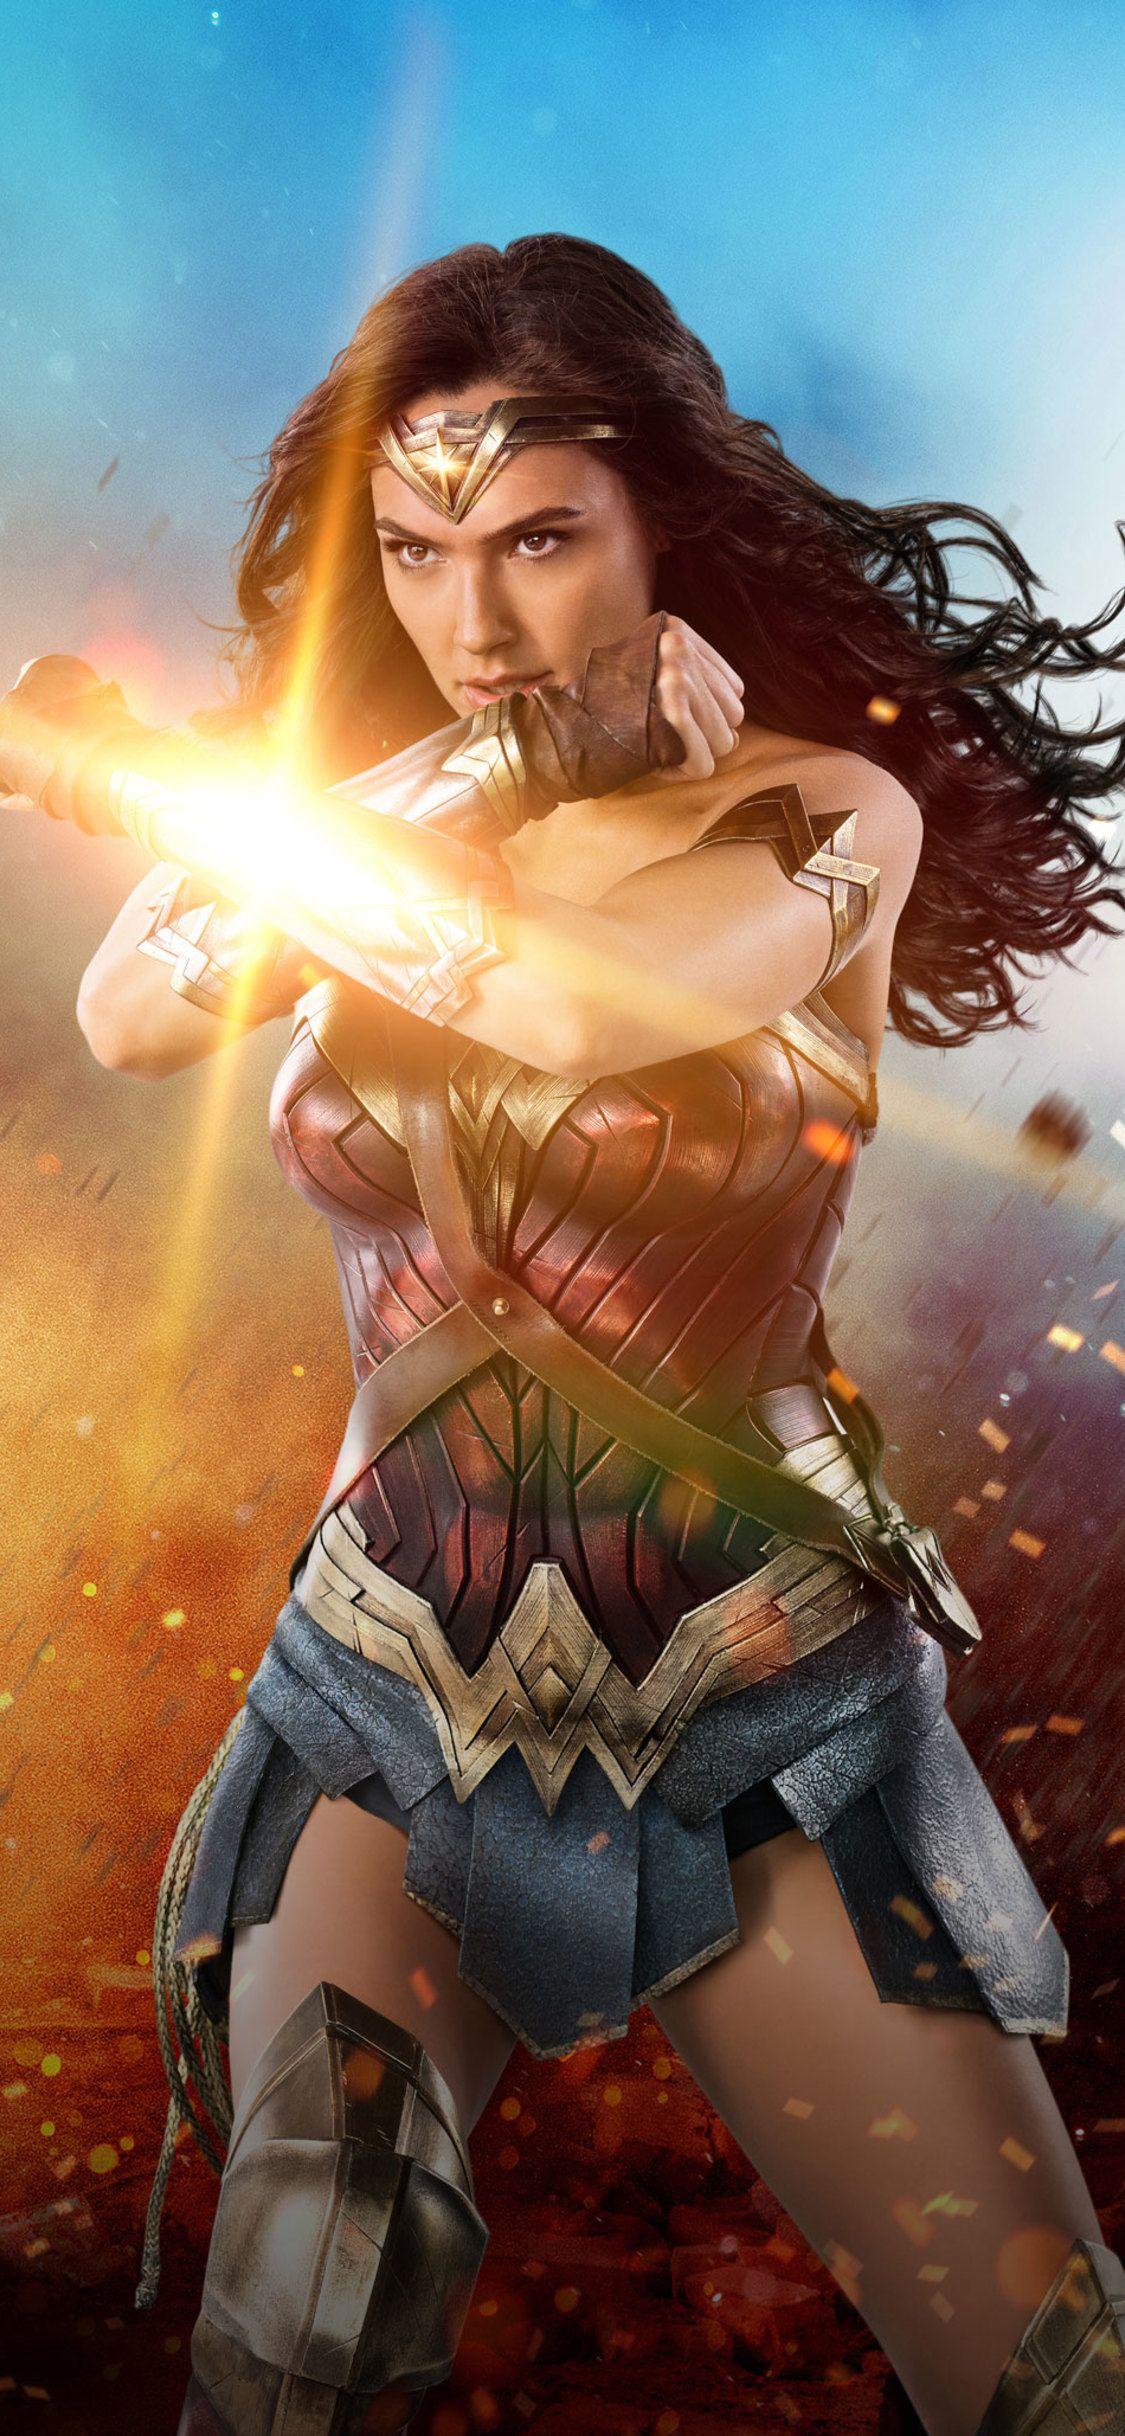 1125x2436 2017 Wonder Woman 4k Iphone XSIphone 10Iphone X HD 4k 1125x2436